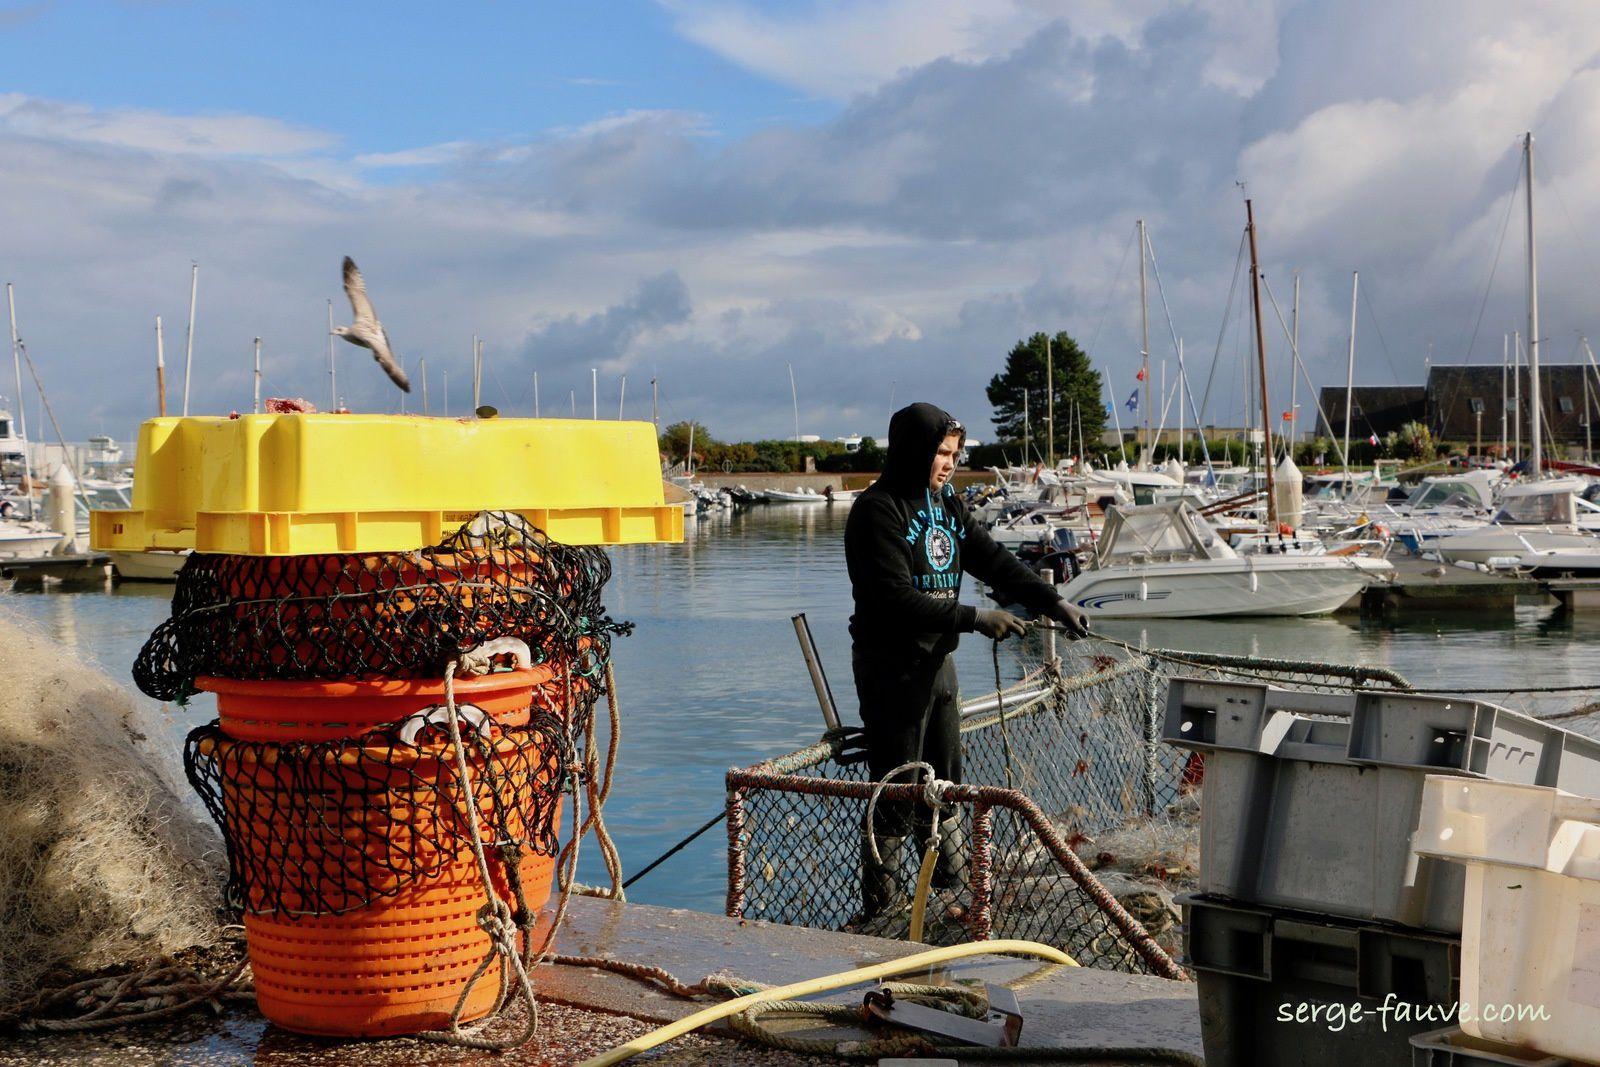 Les pêcheurs de St Vaast la Hougue : LES 12 SUIVANTES